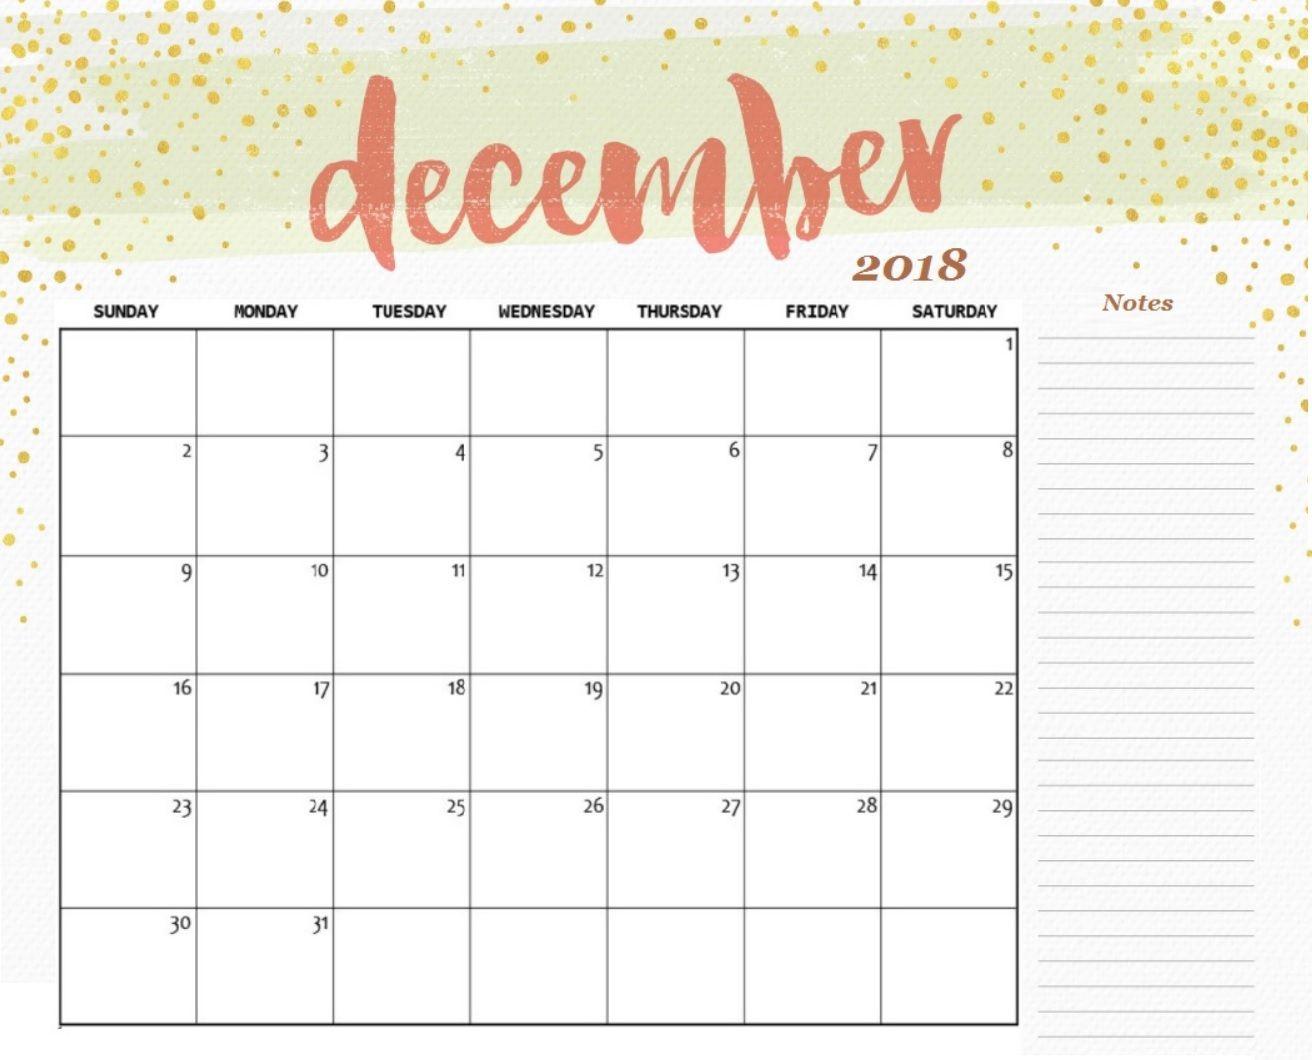 December 2018 Calendar Printable Template | 100+ December 2018 with Blank Calendar Printable December Template